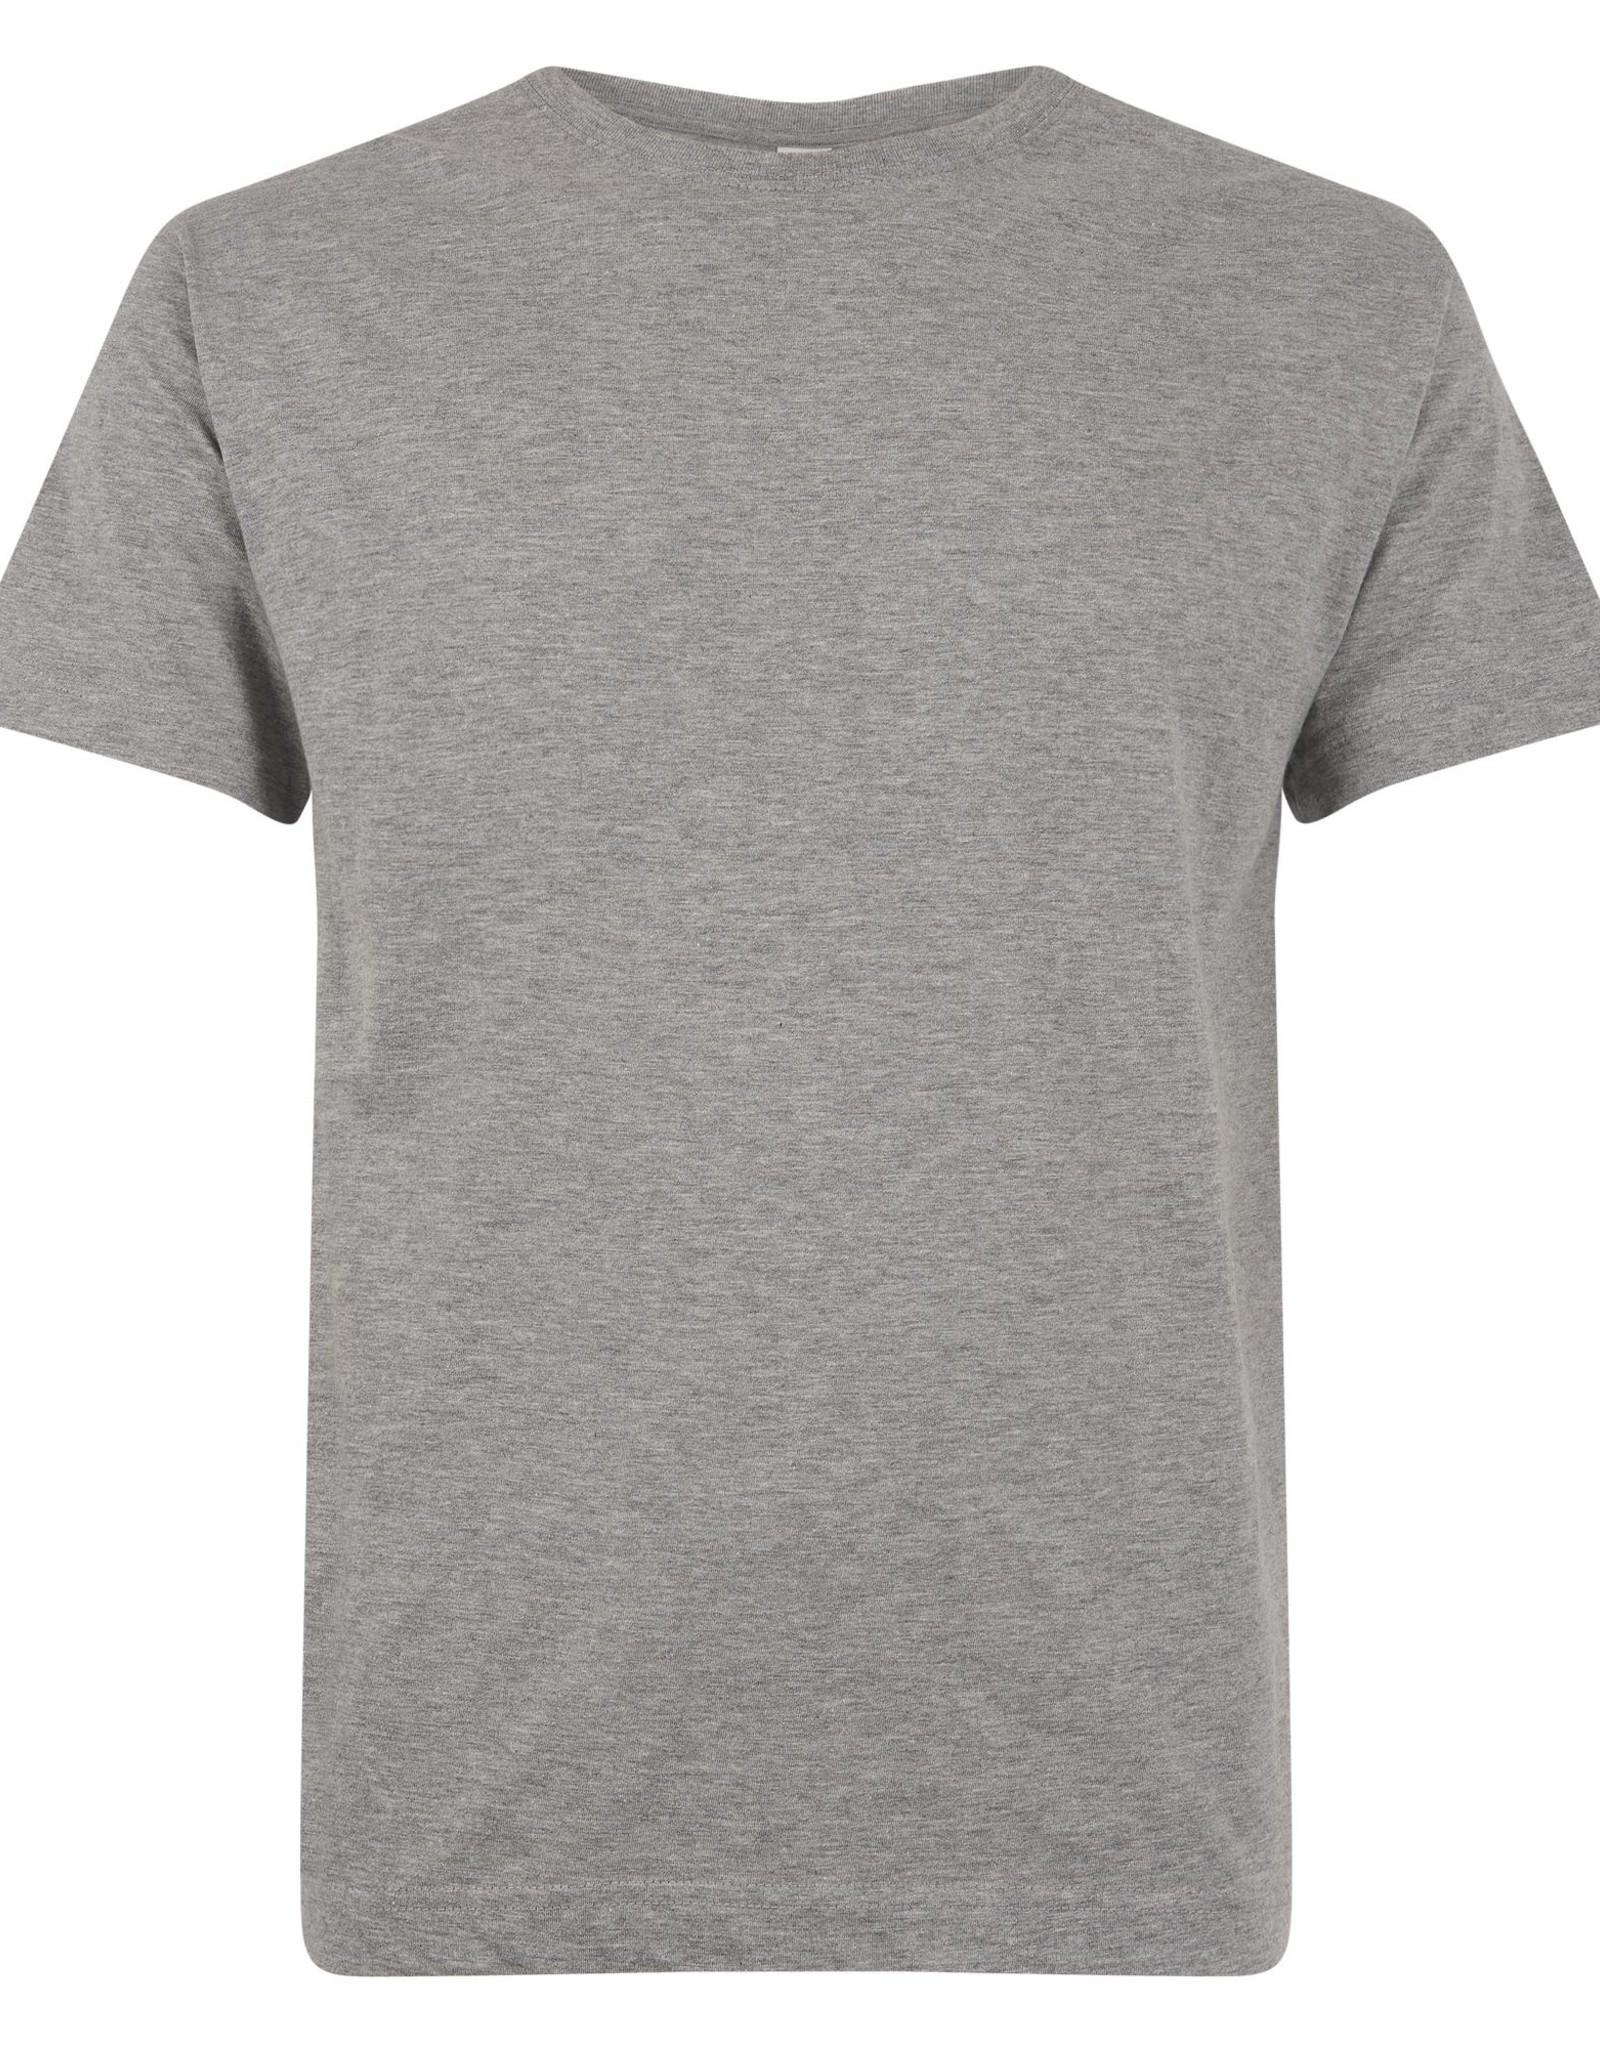 Logostar T-SHIRT basic met ronde hals grijs